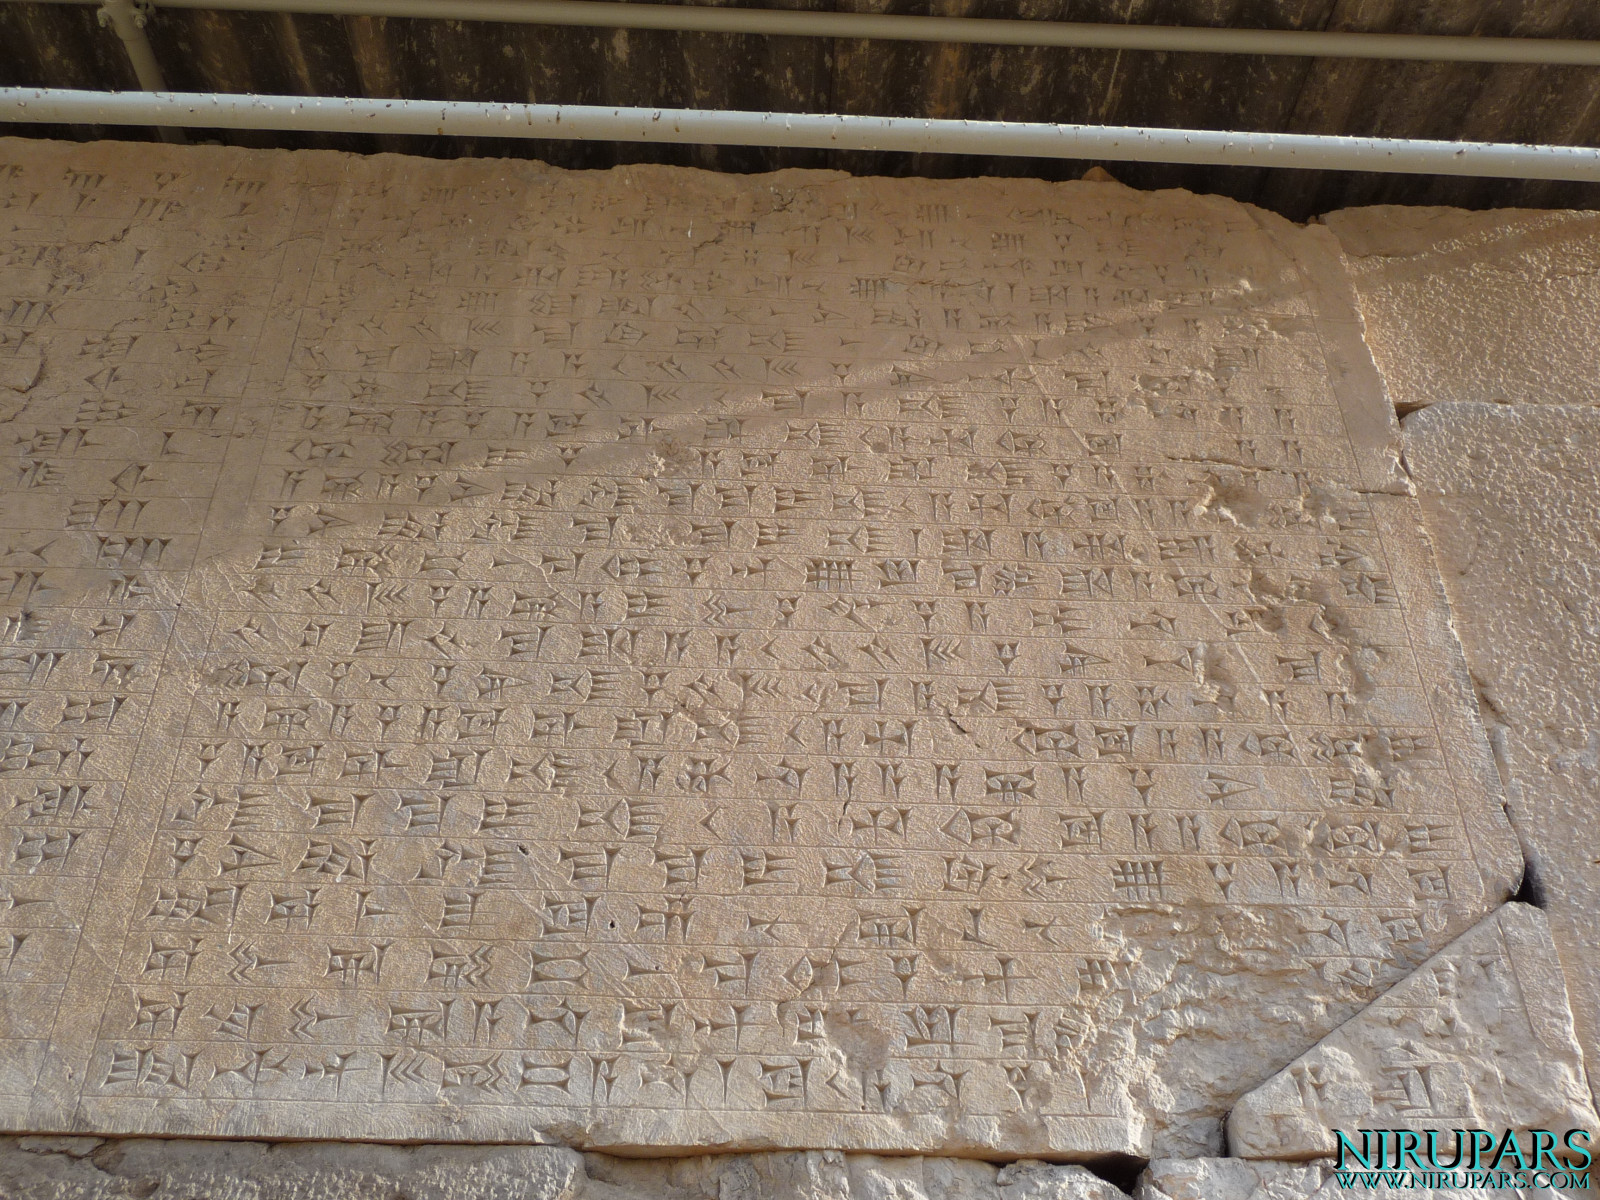 Persepolis - Foundation Inscription - Darius the Great